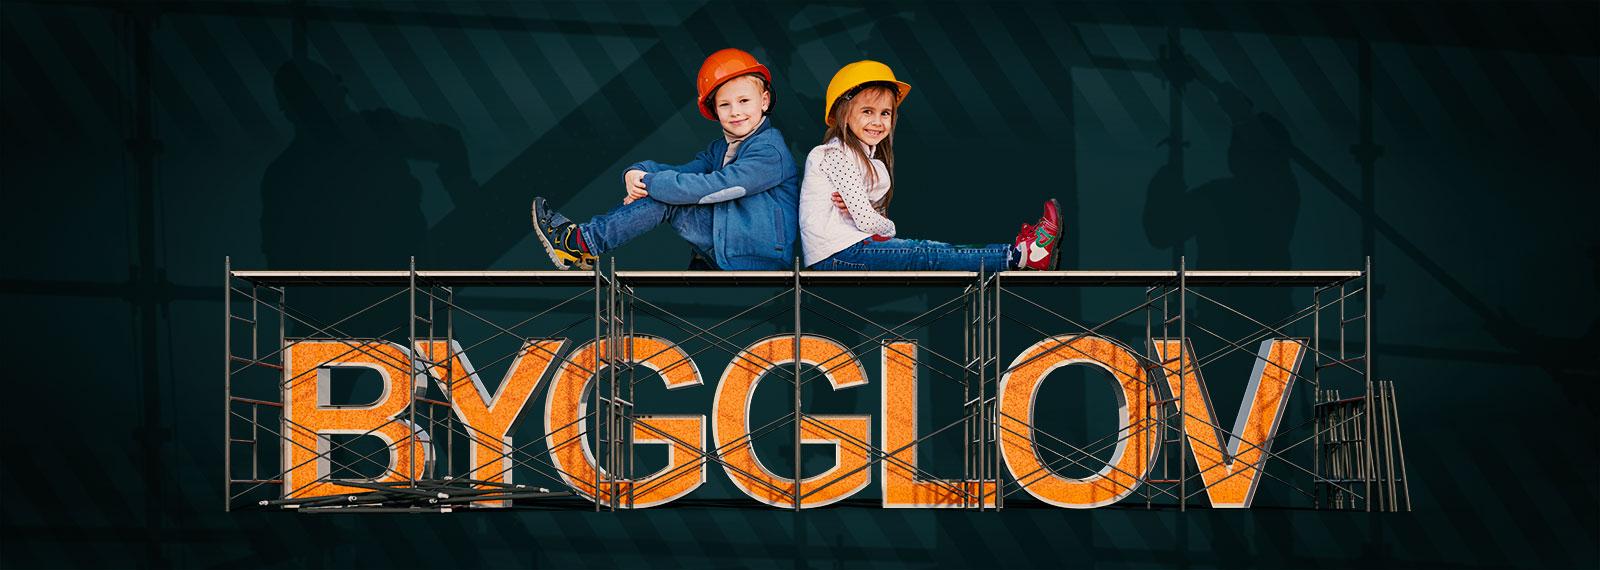 bygglov-banner-1600x570